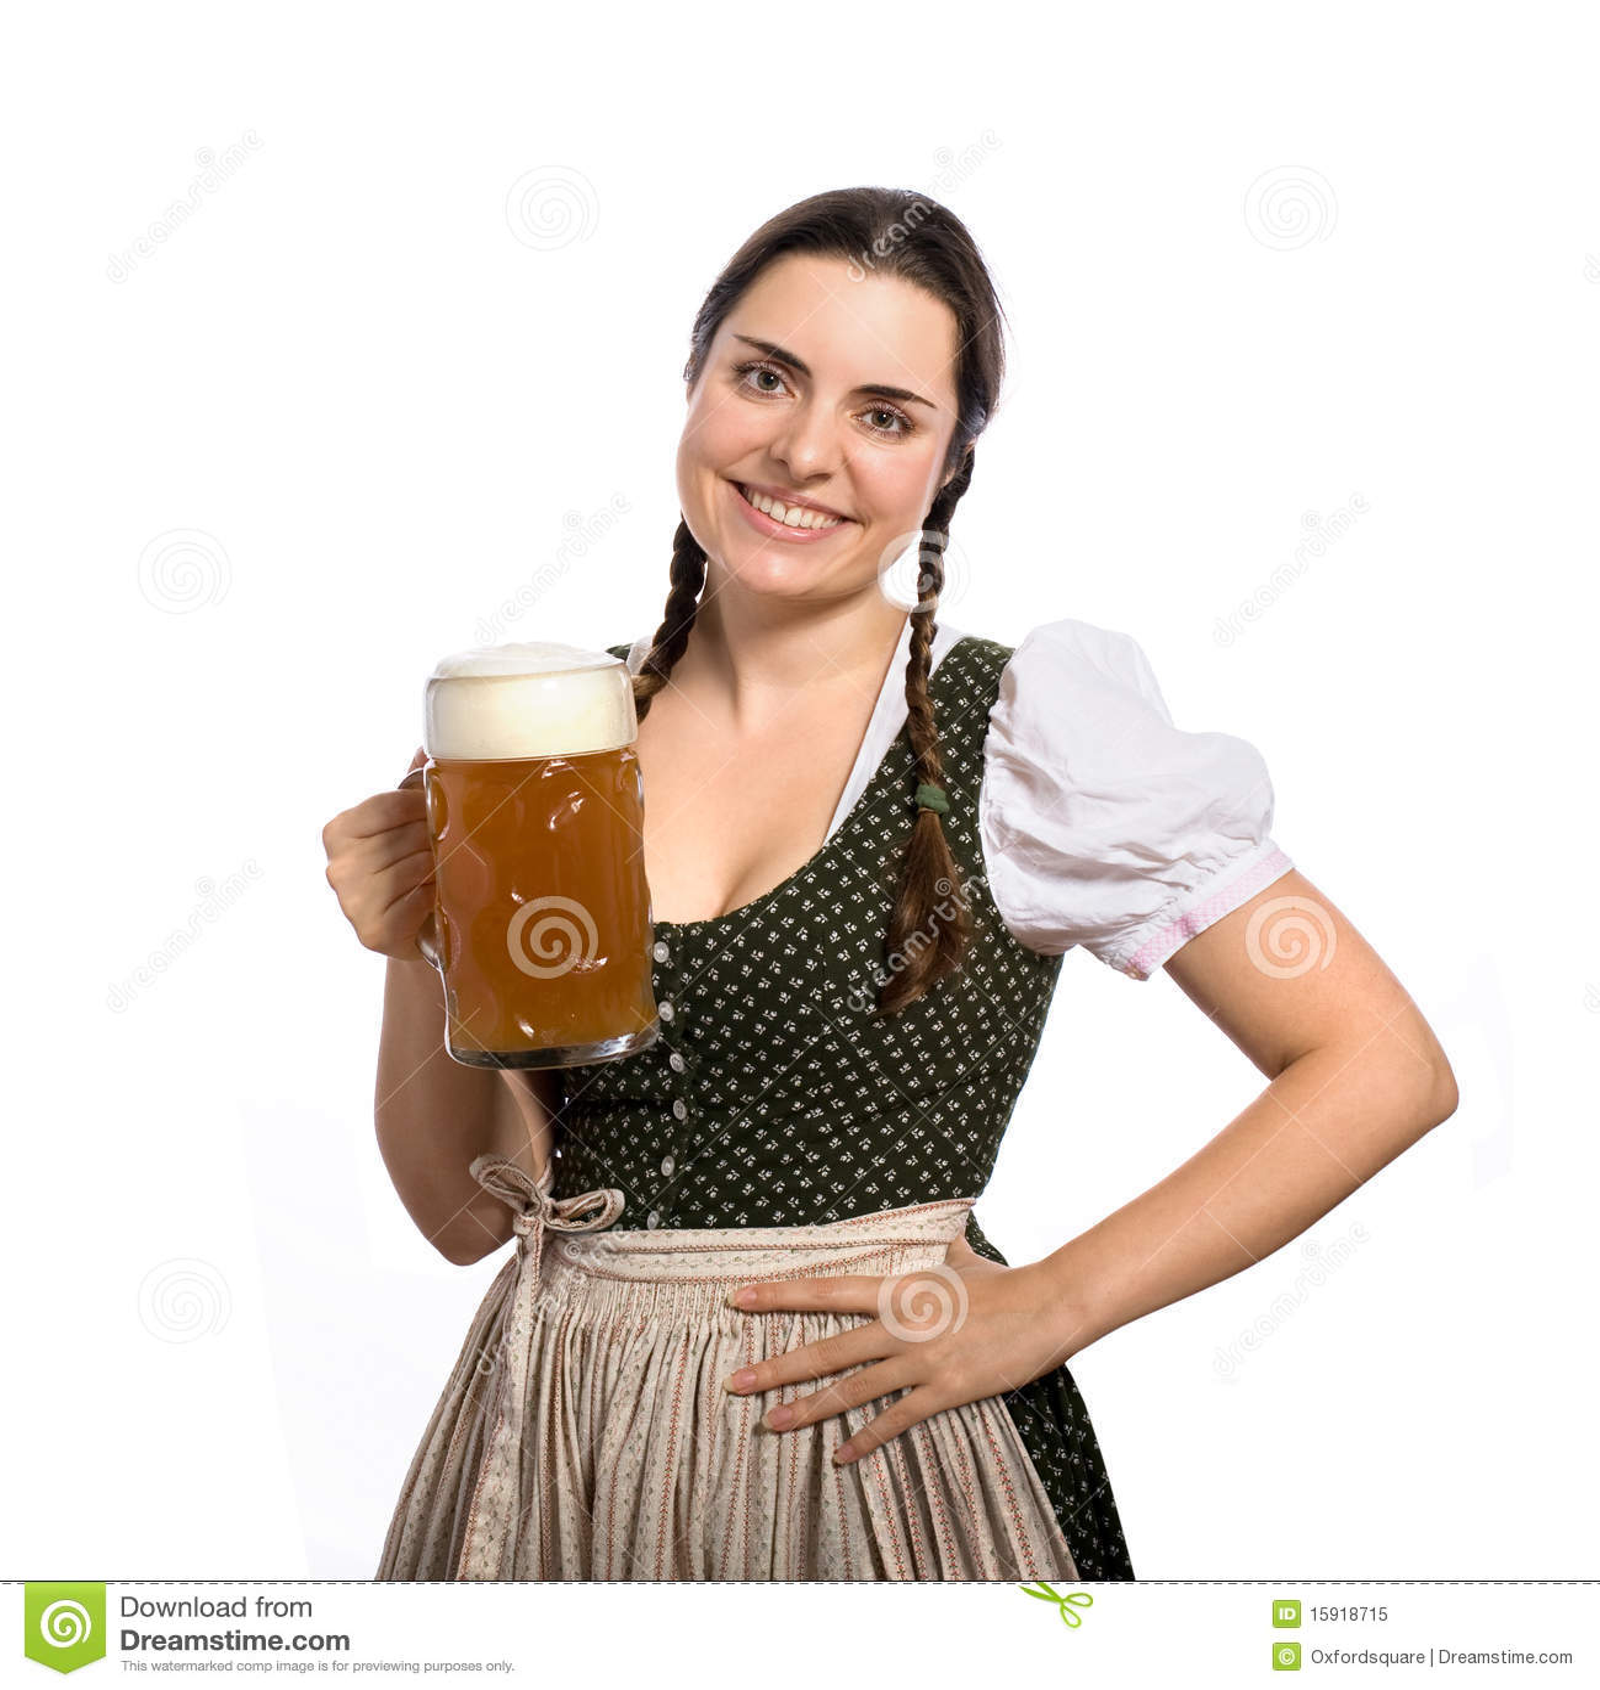 yet did not Single frauen aus osnabrück congratulate, what excellent message